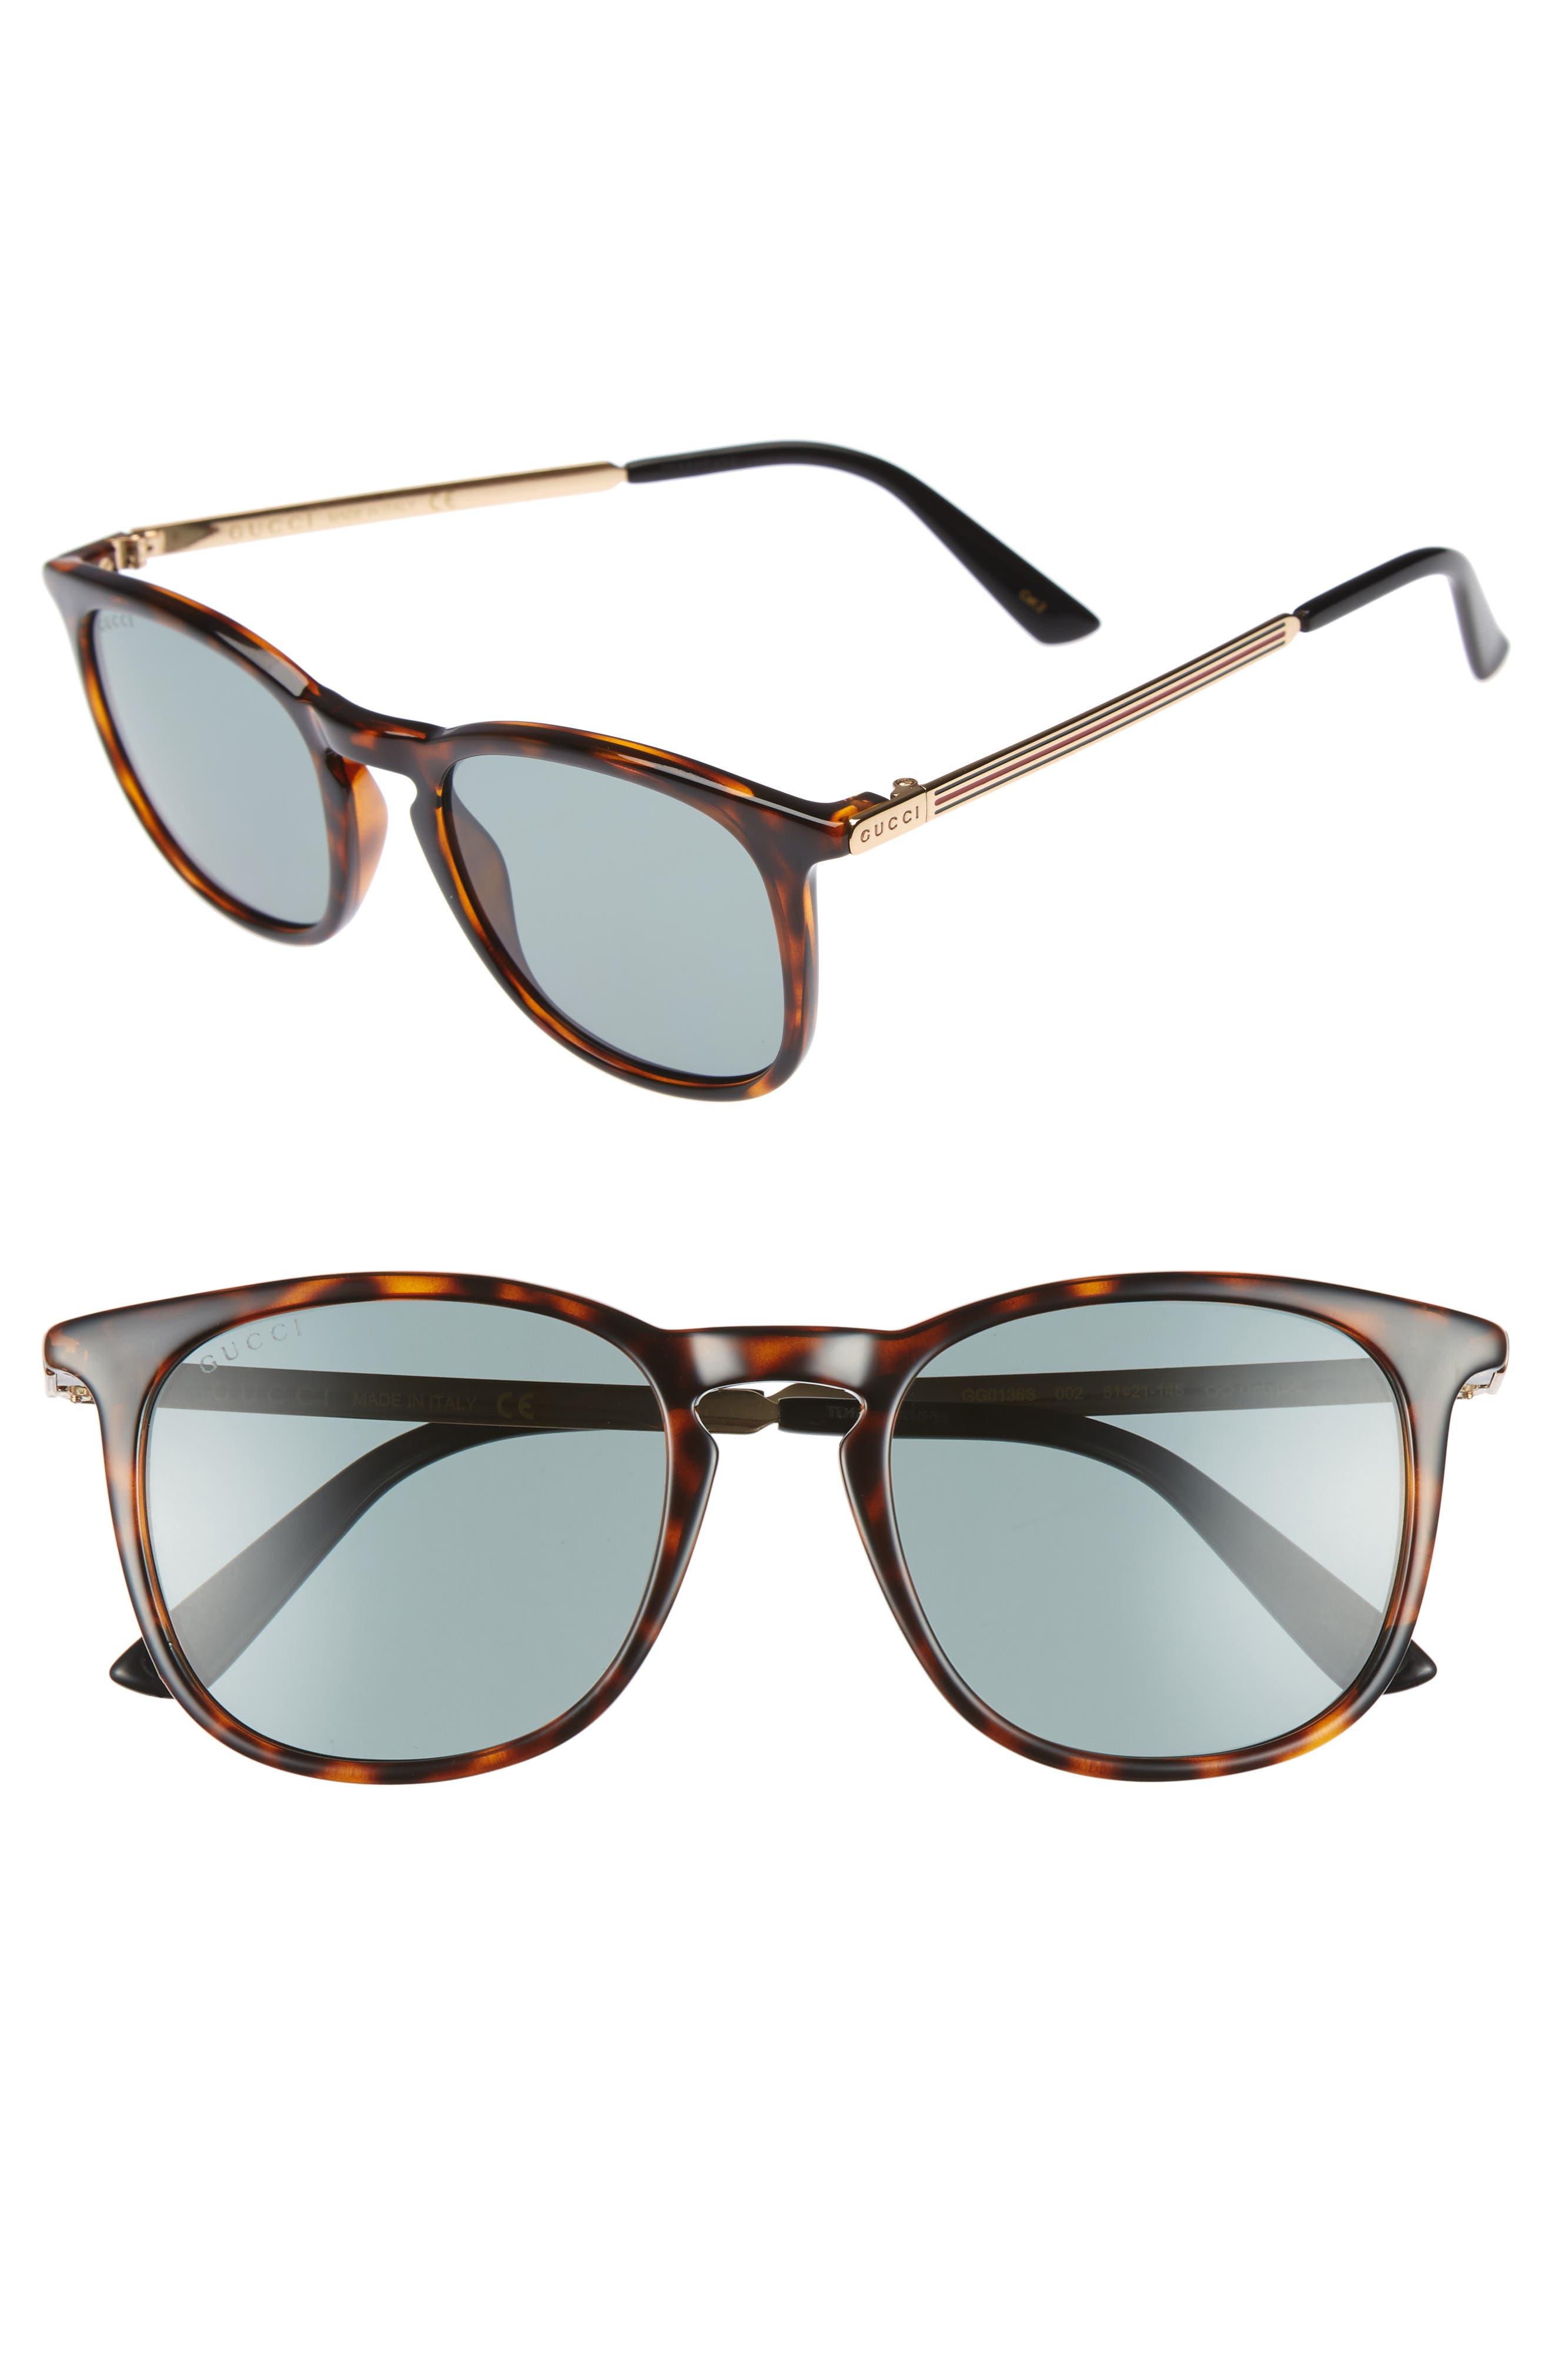 Gucci Optyl 51mm Sunglasses